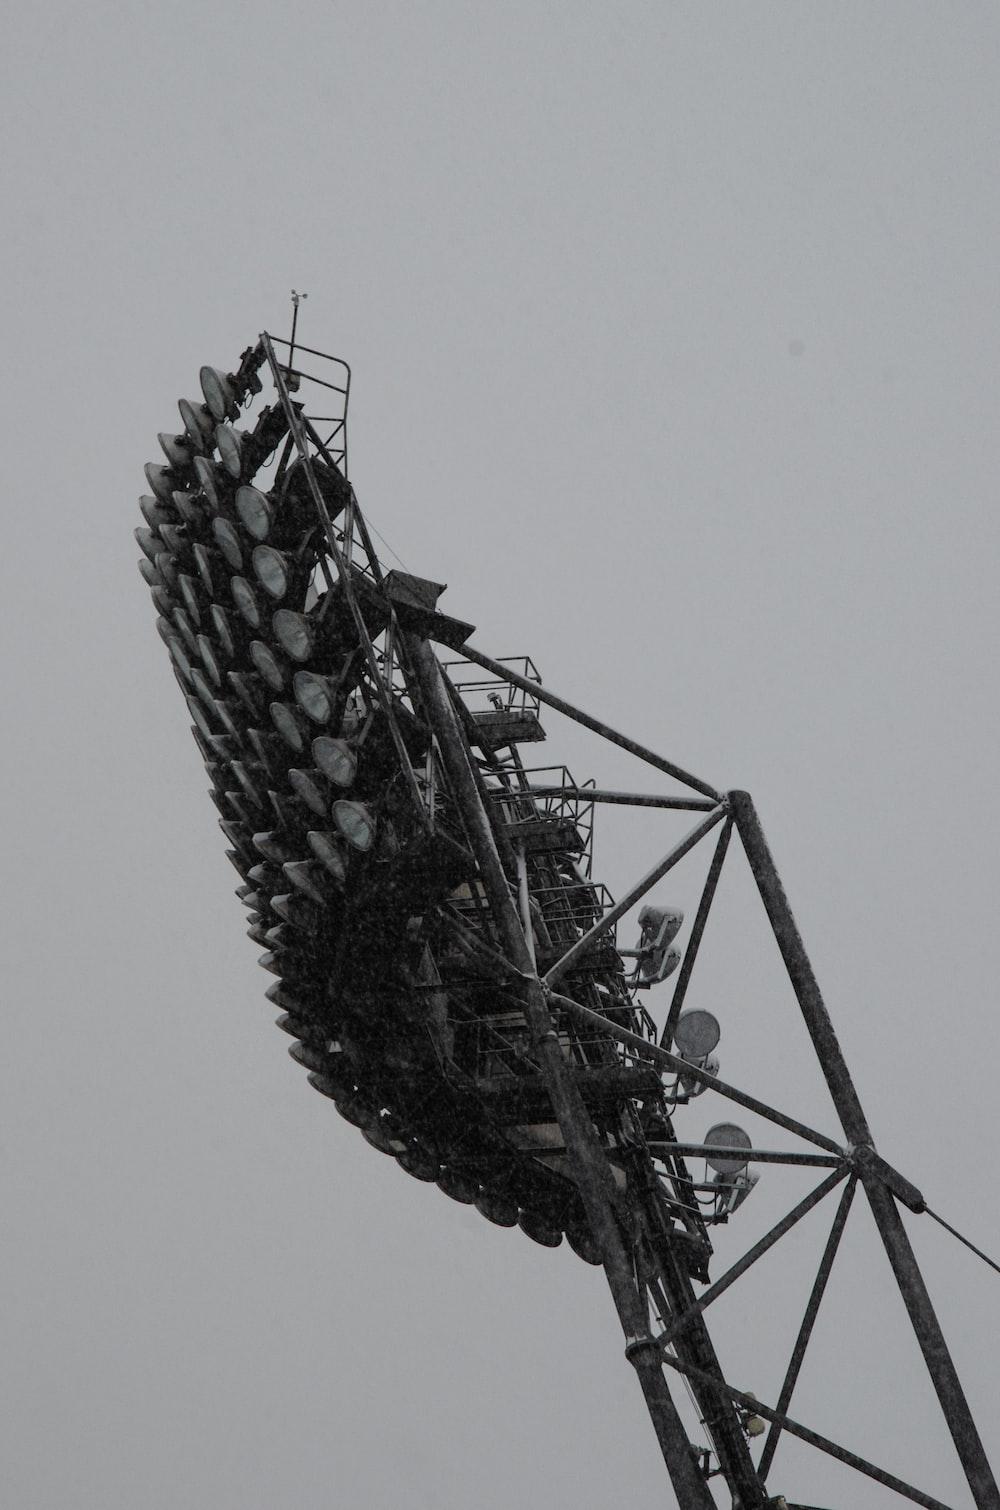 black and gray ferris wheel